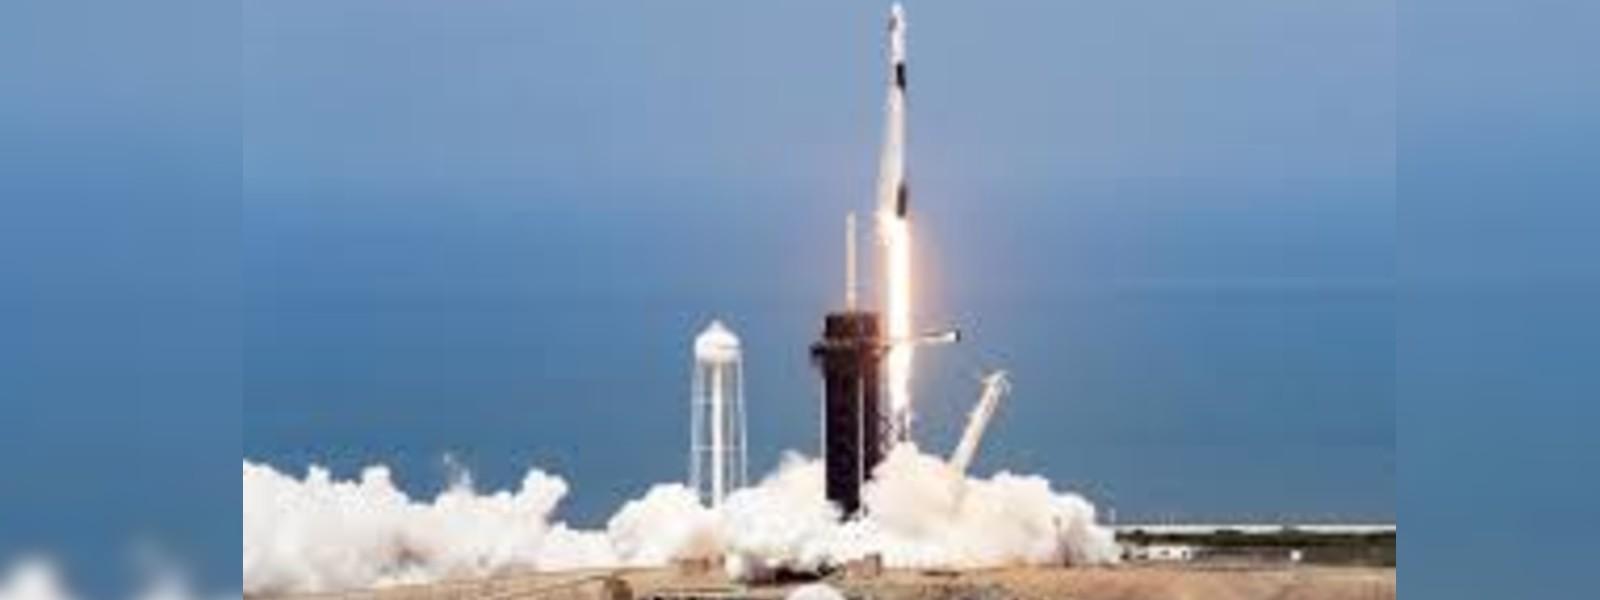 SpaceX & NASA sent 2 astronauts into orbit